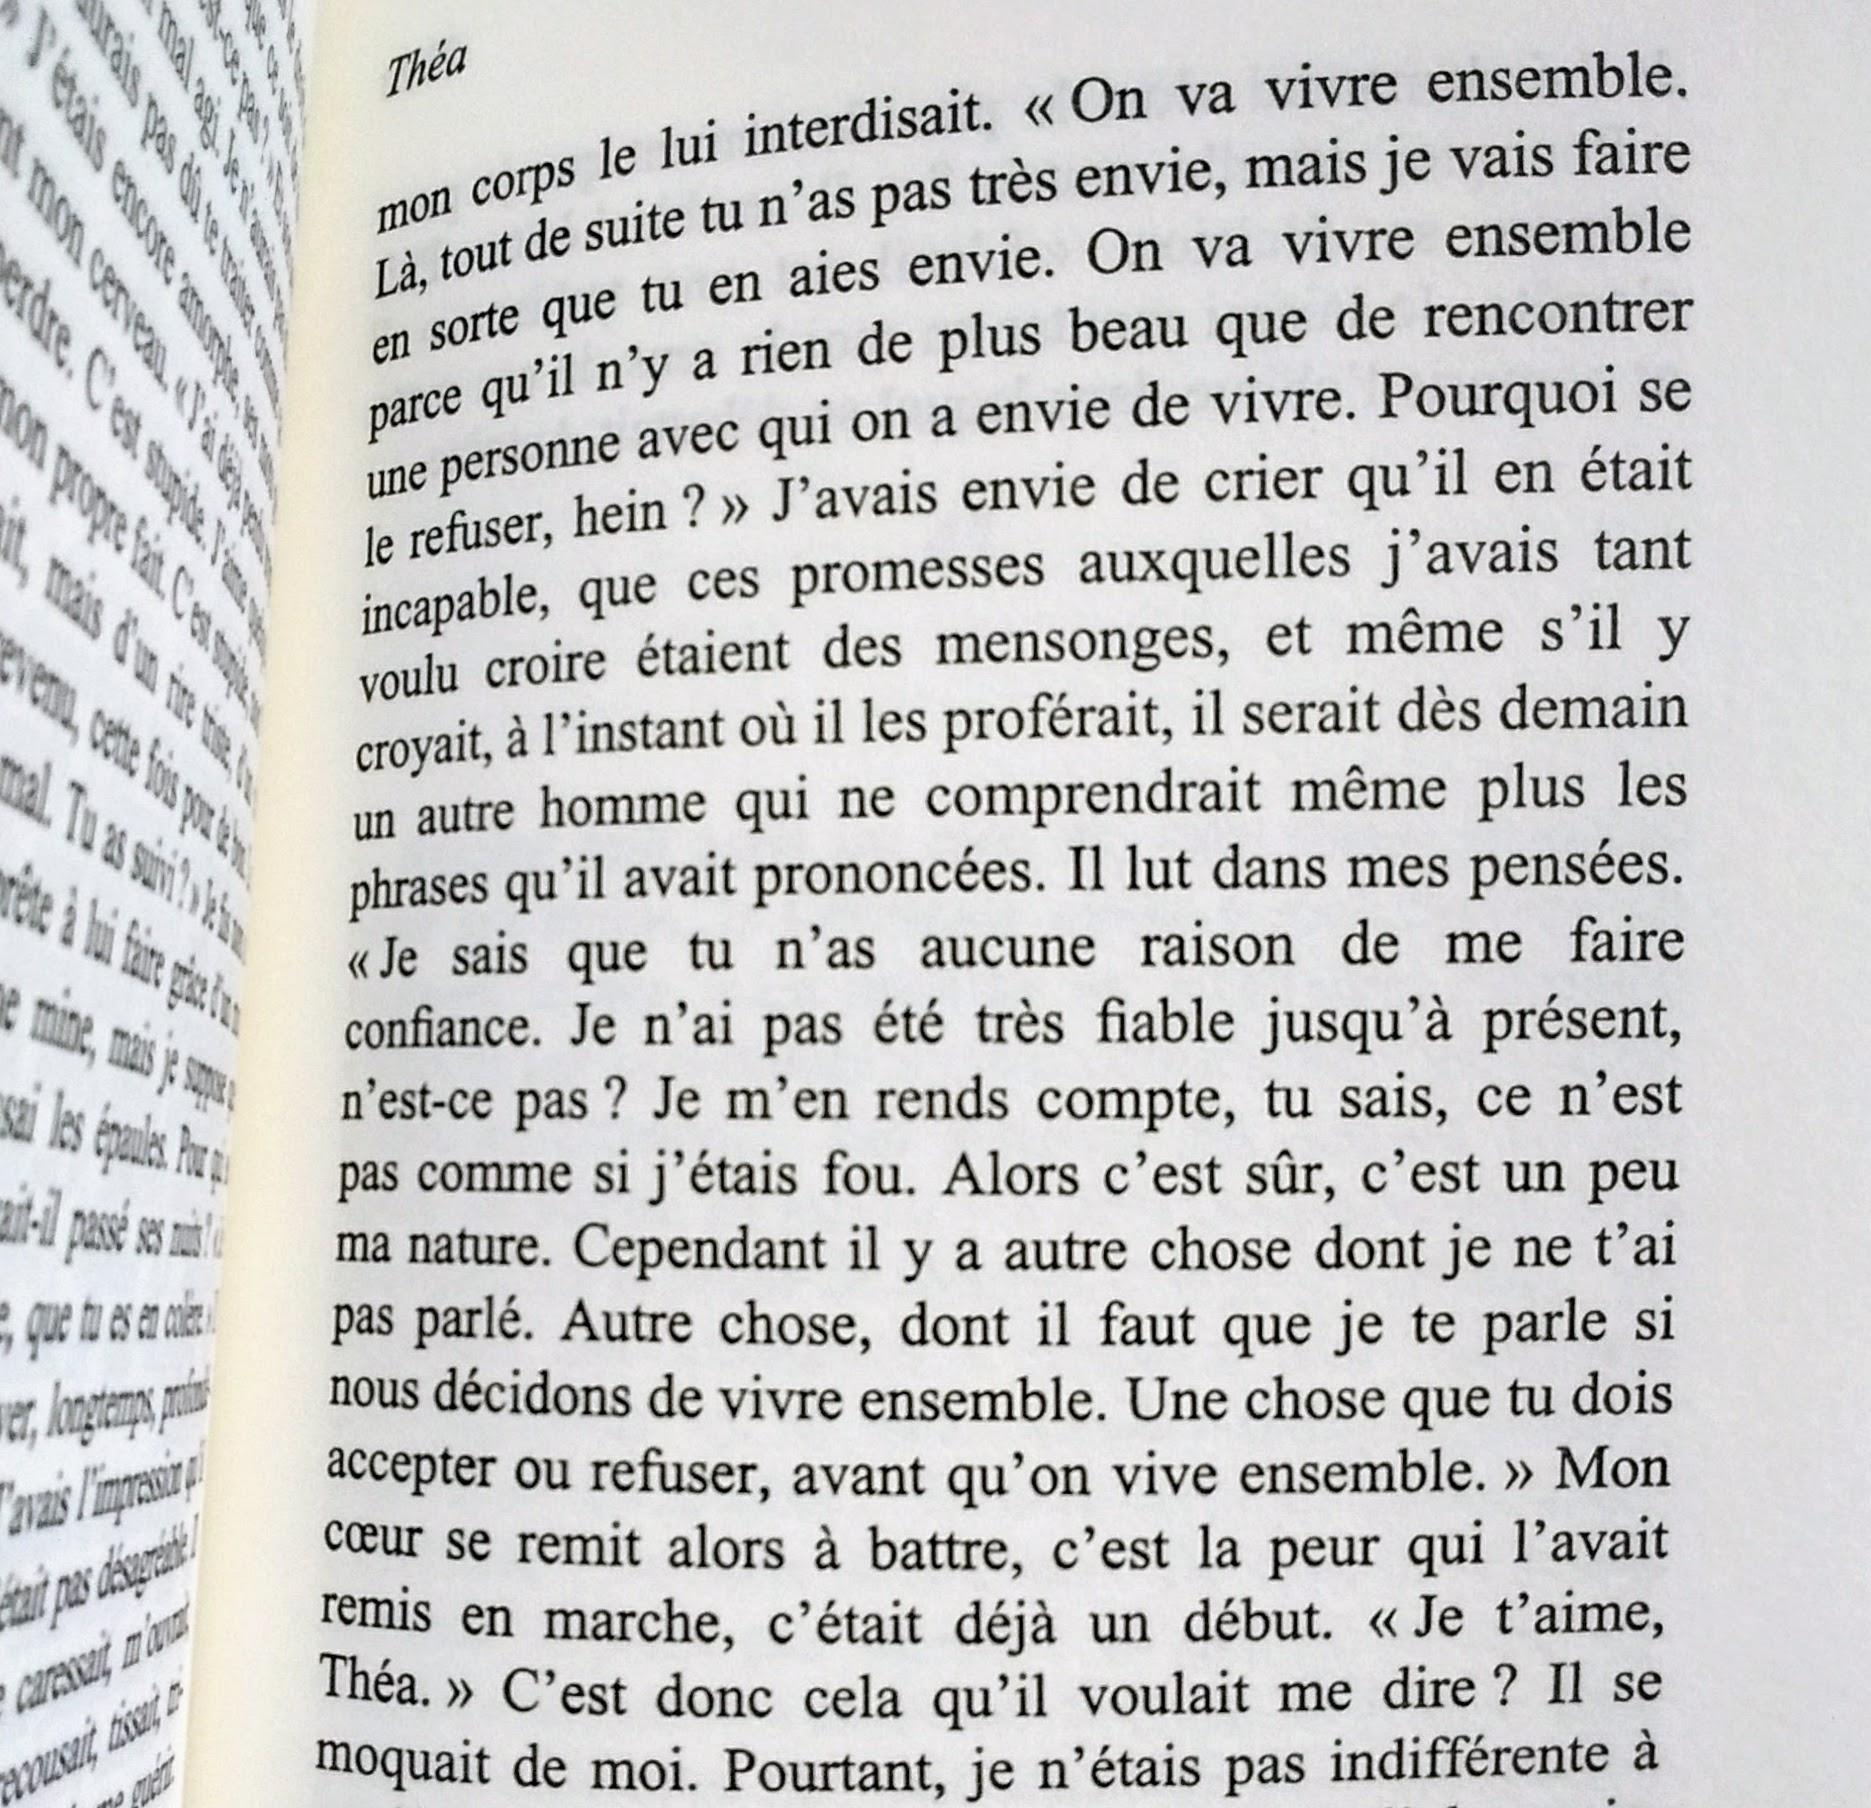 Théa de Mazarine Pingeot